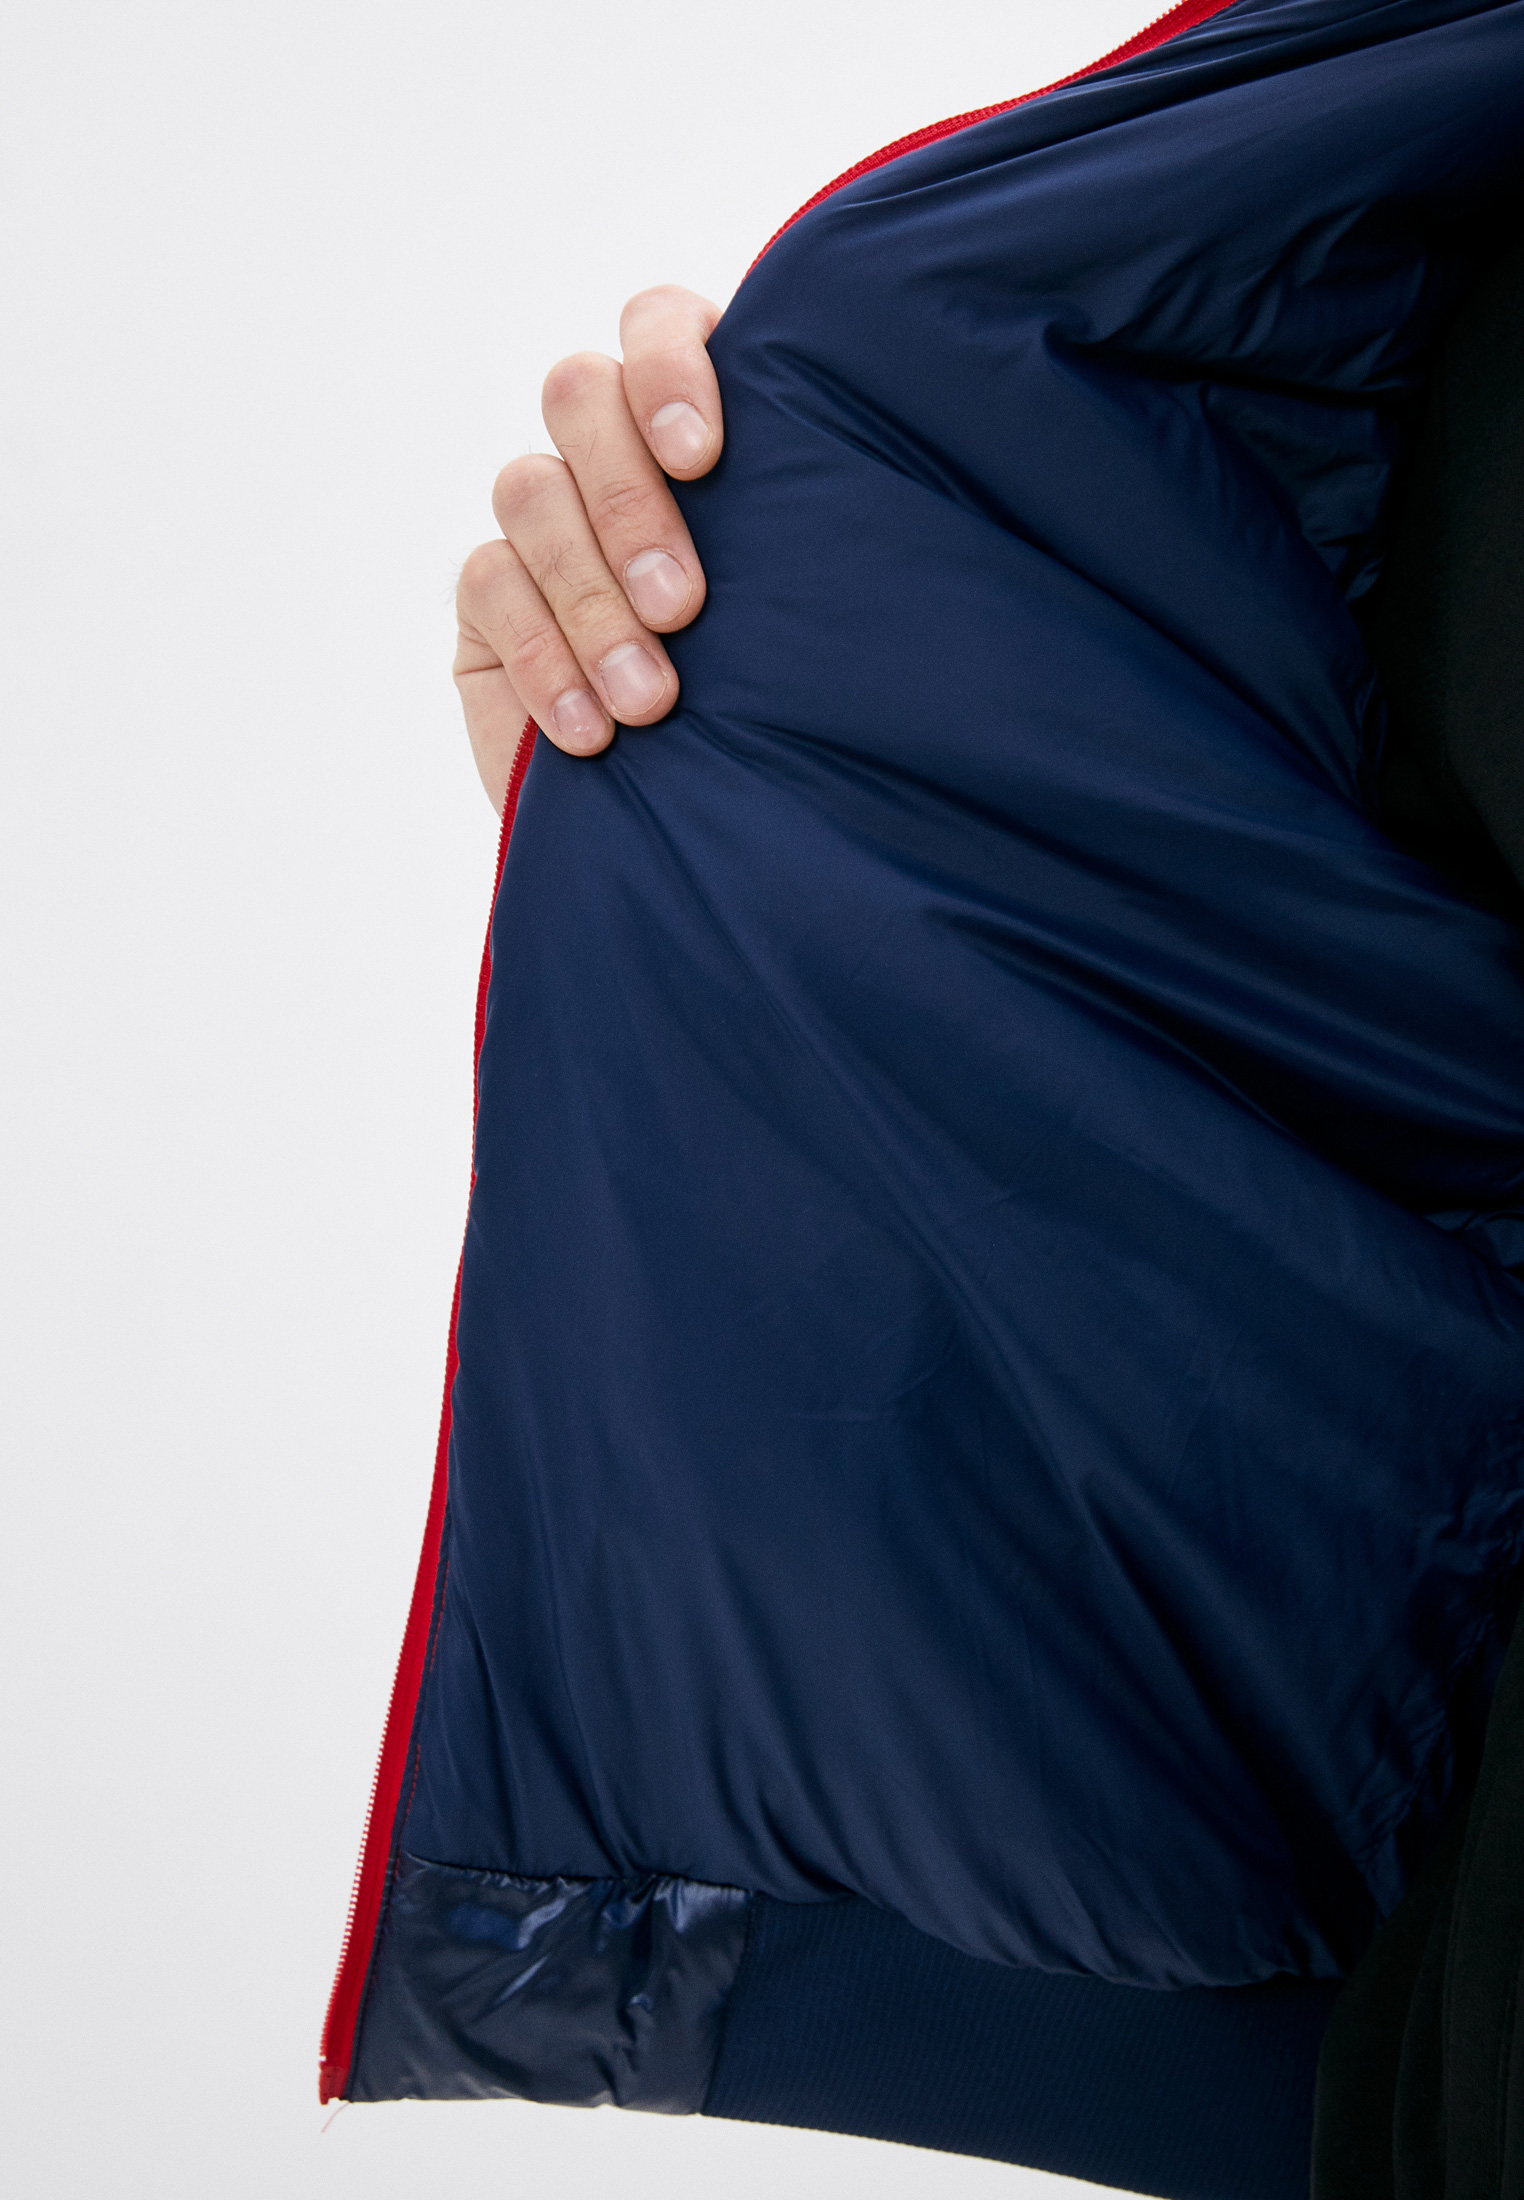 Мужская куртка Bikkembergs (Биккембергс) C H 082 01 T 9846: изображение 11